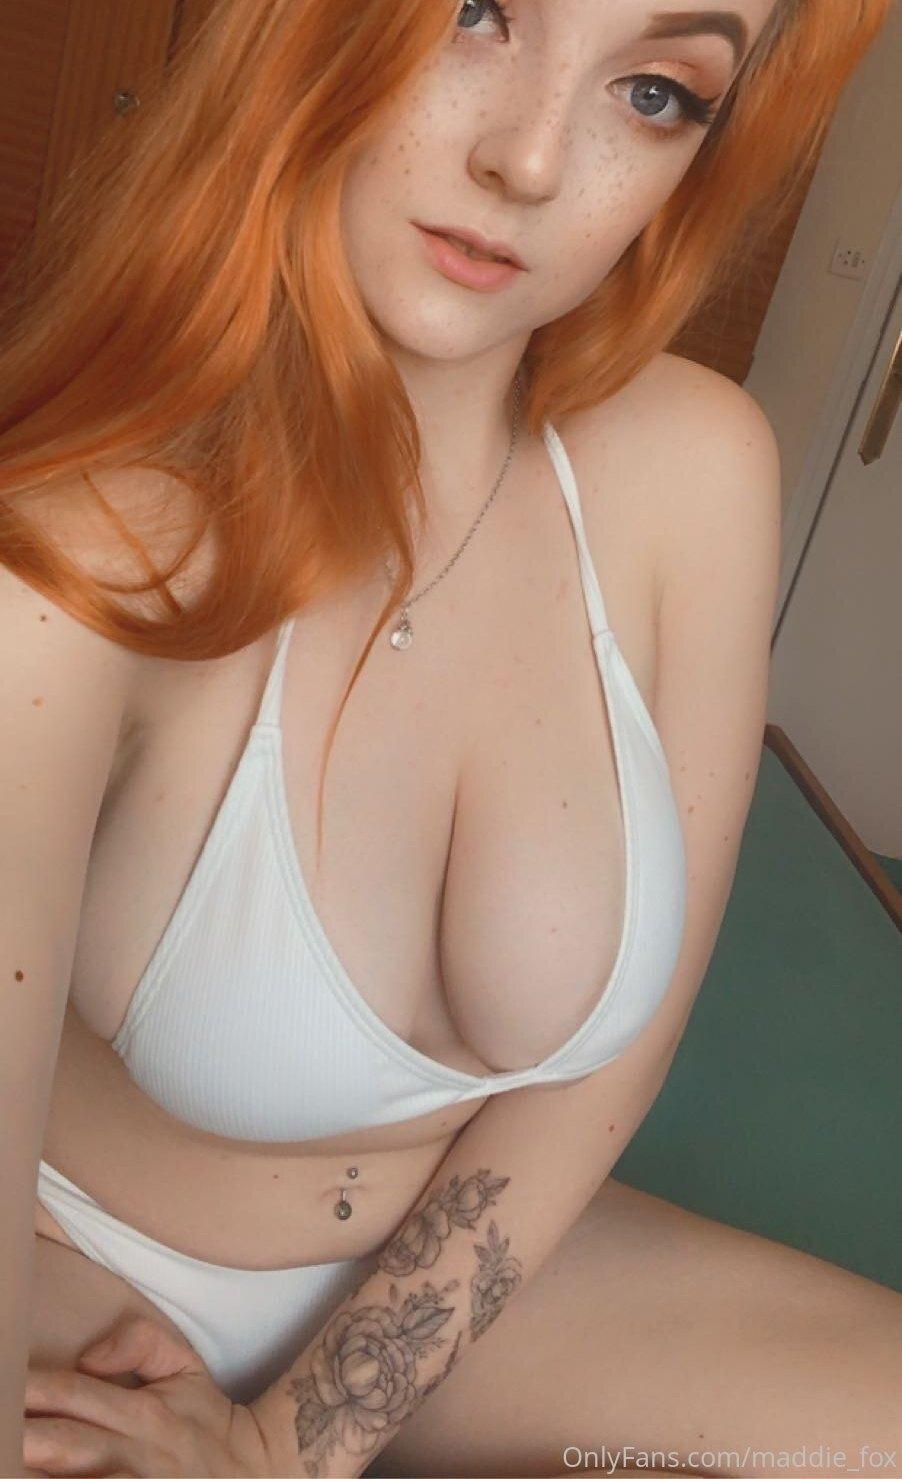 Maddie Fox Onlyfans Nudes Leaks 0020